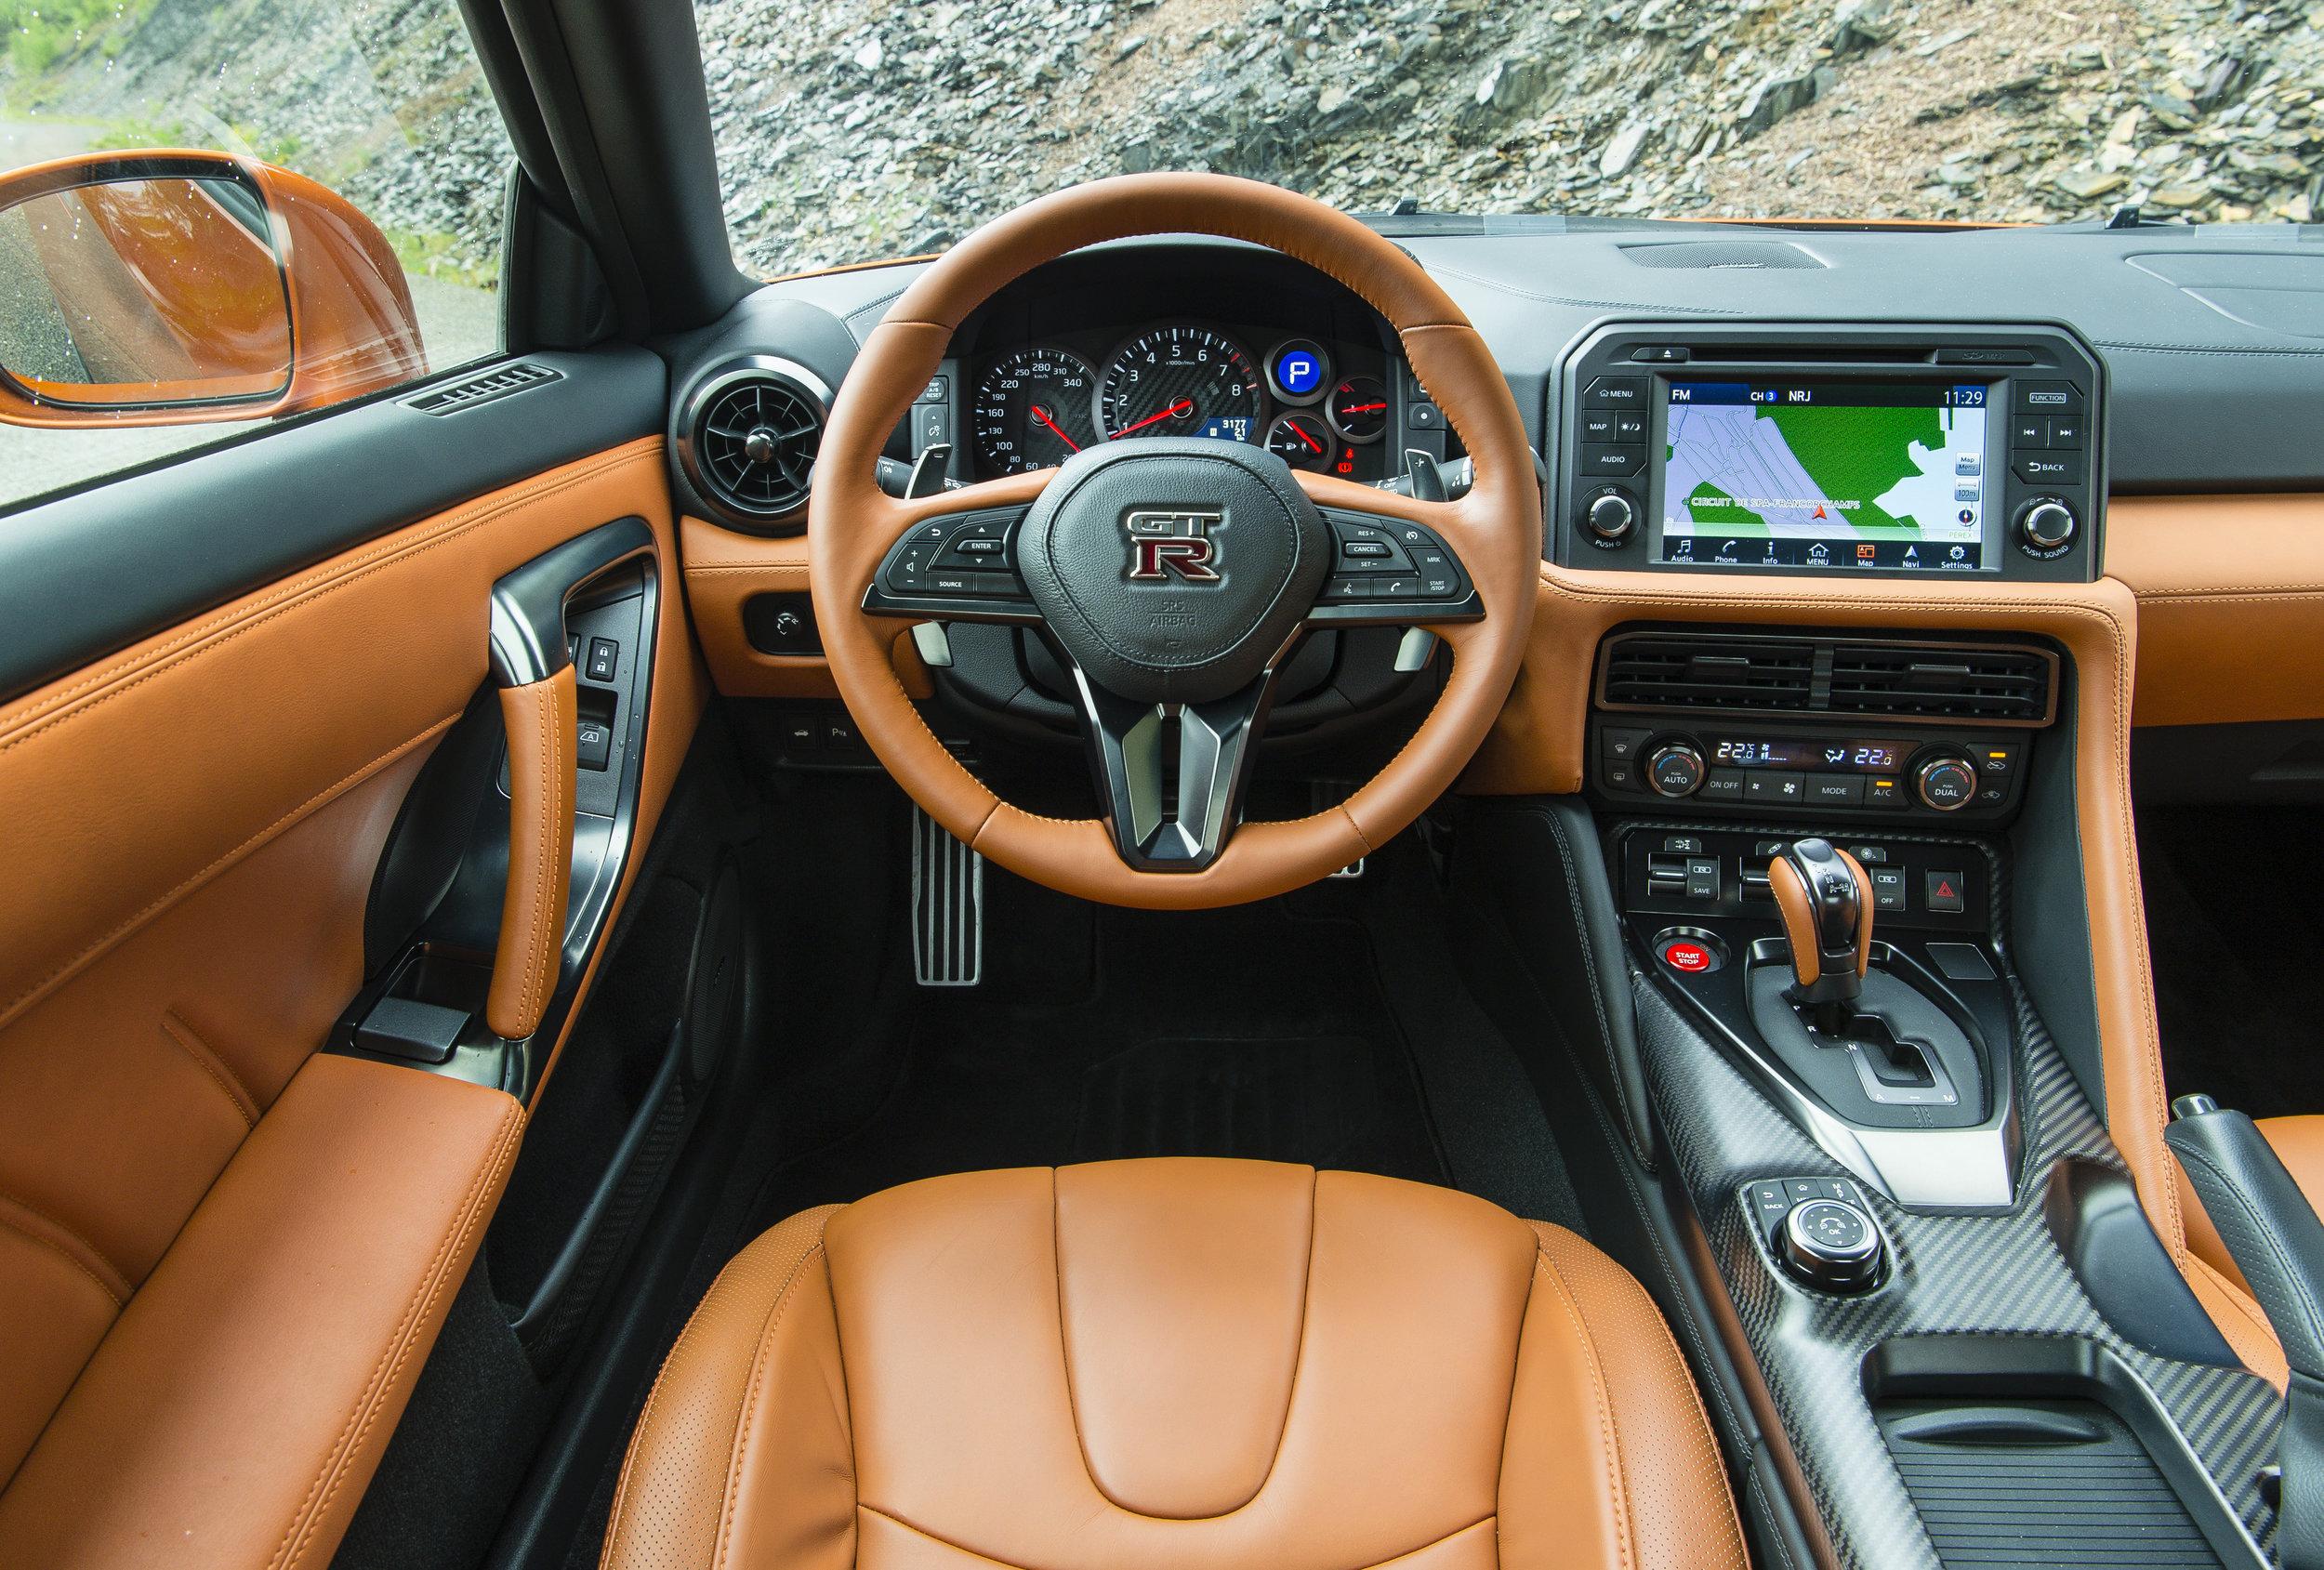 2017 Nissan GT-R Premium in Katsura Orange